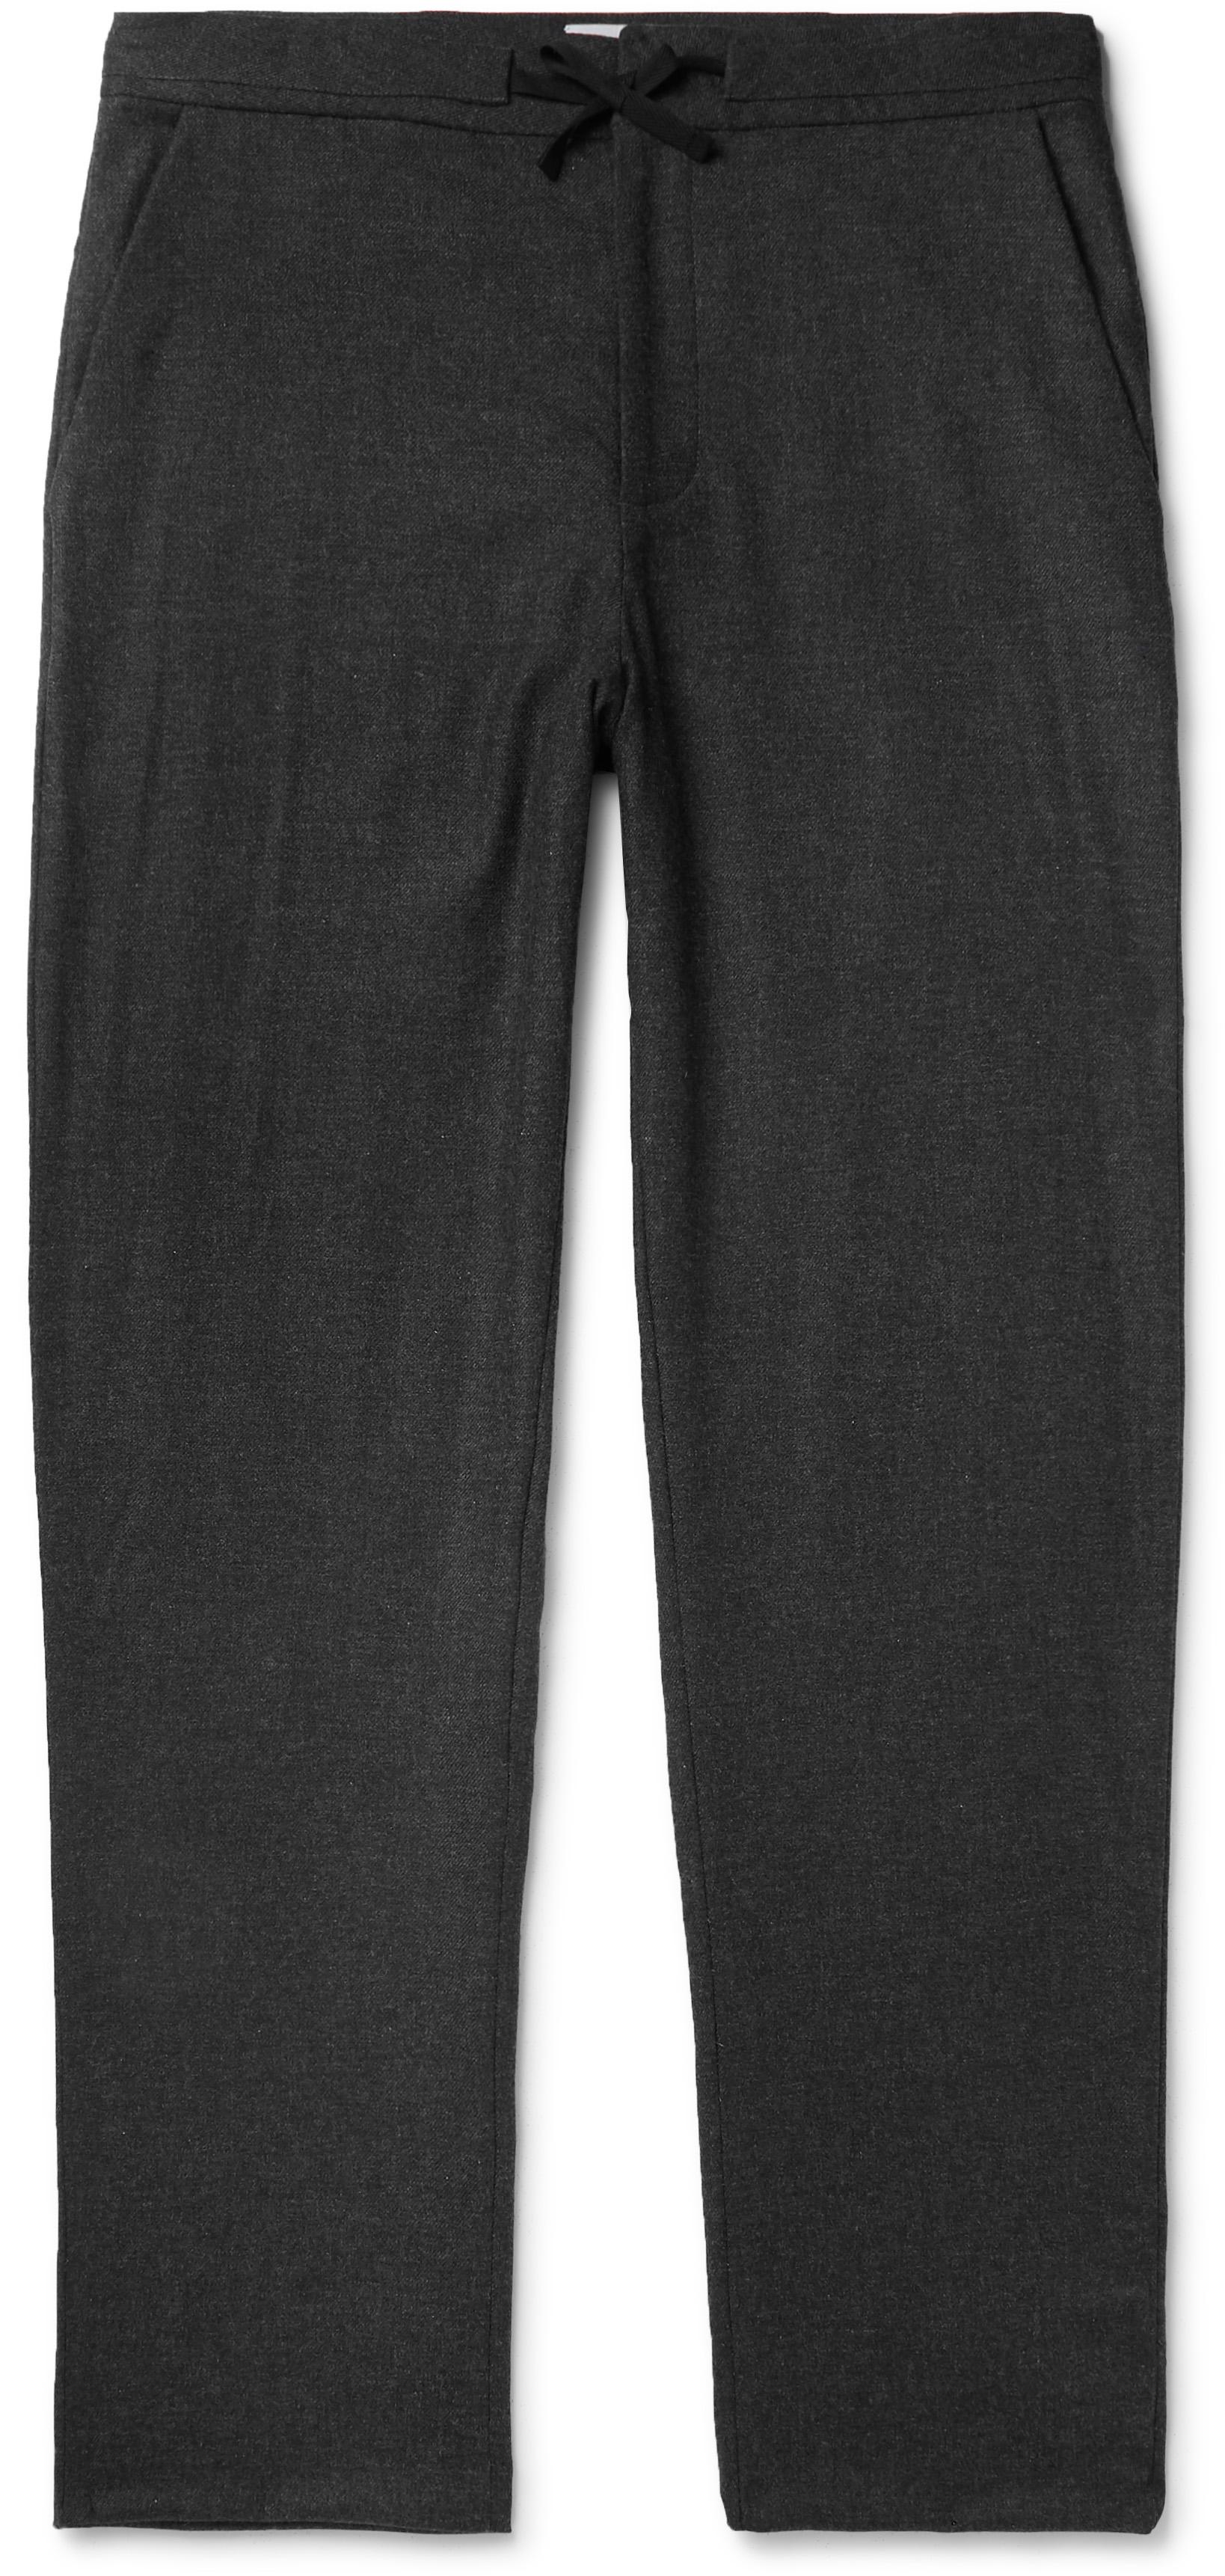 Merino wool blend drawstring trousers